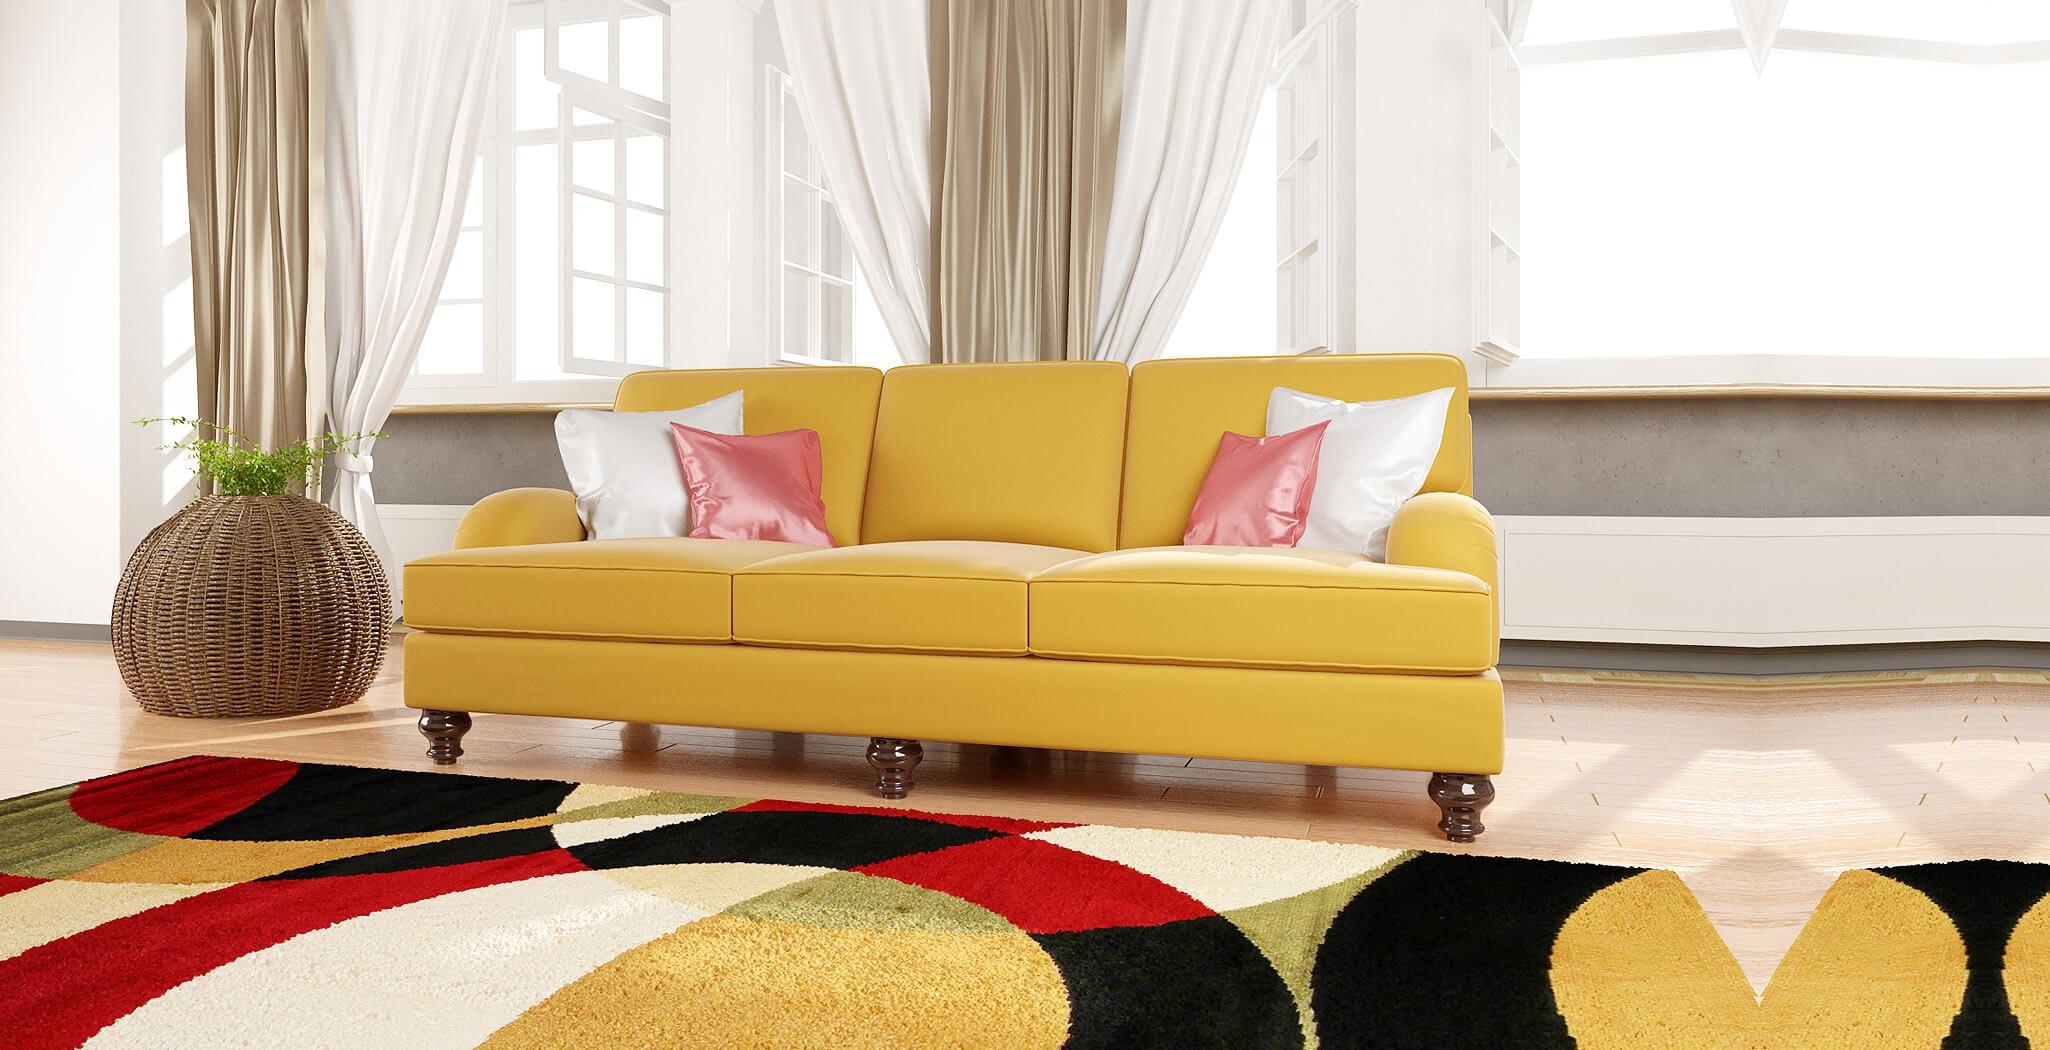 hamilton sofa furniture gallery 5